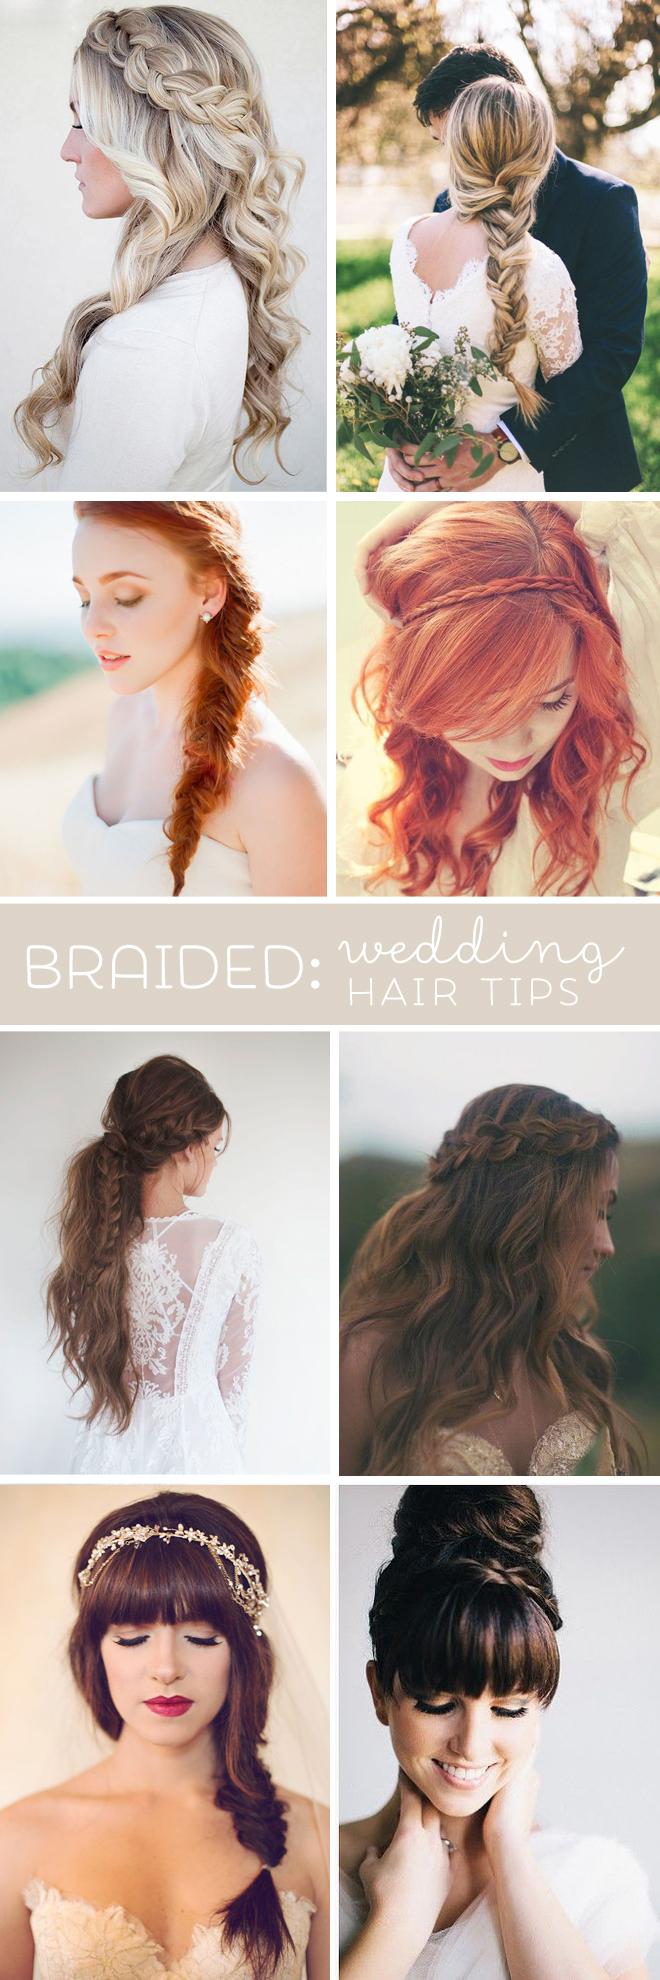 "Wedding hair tips for ""braids"""